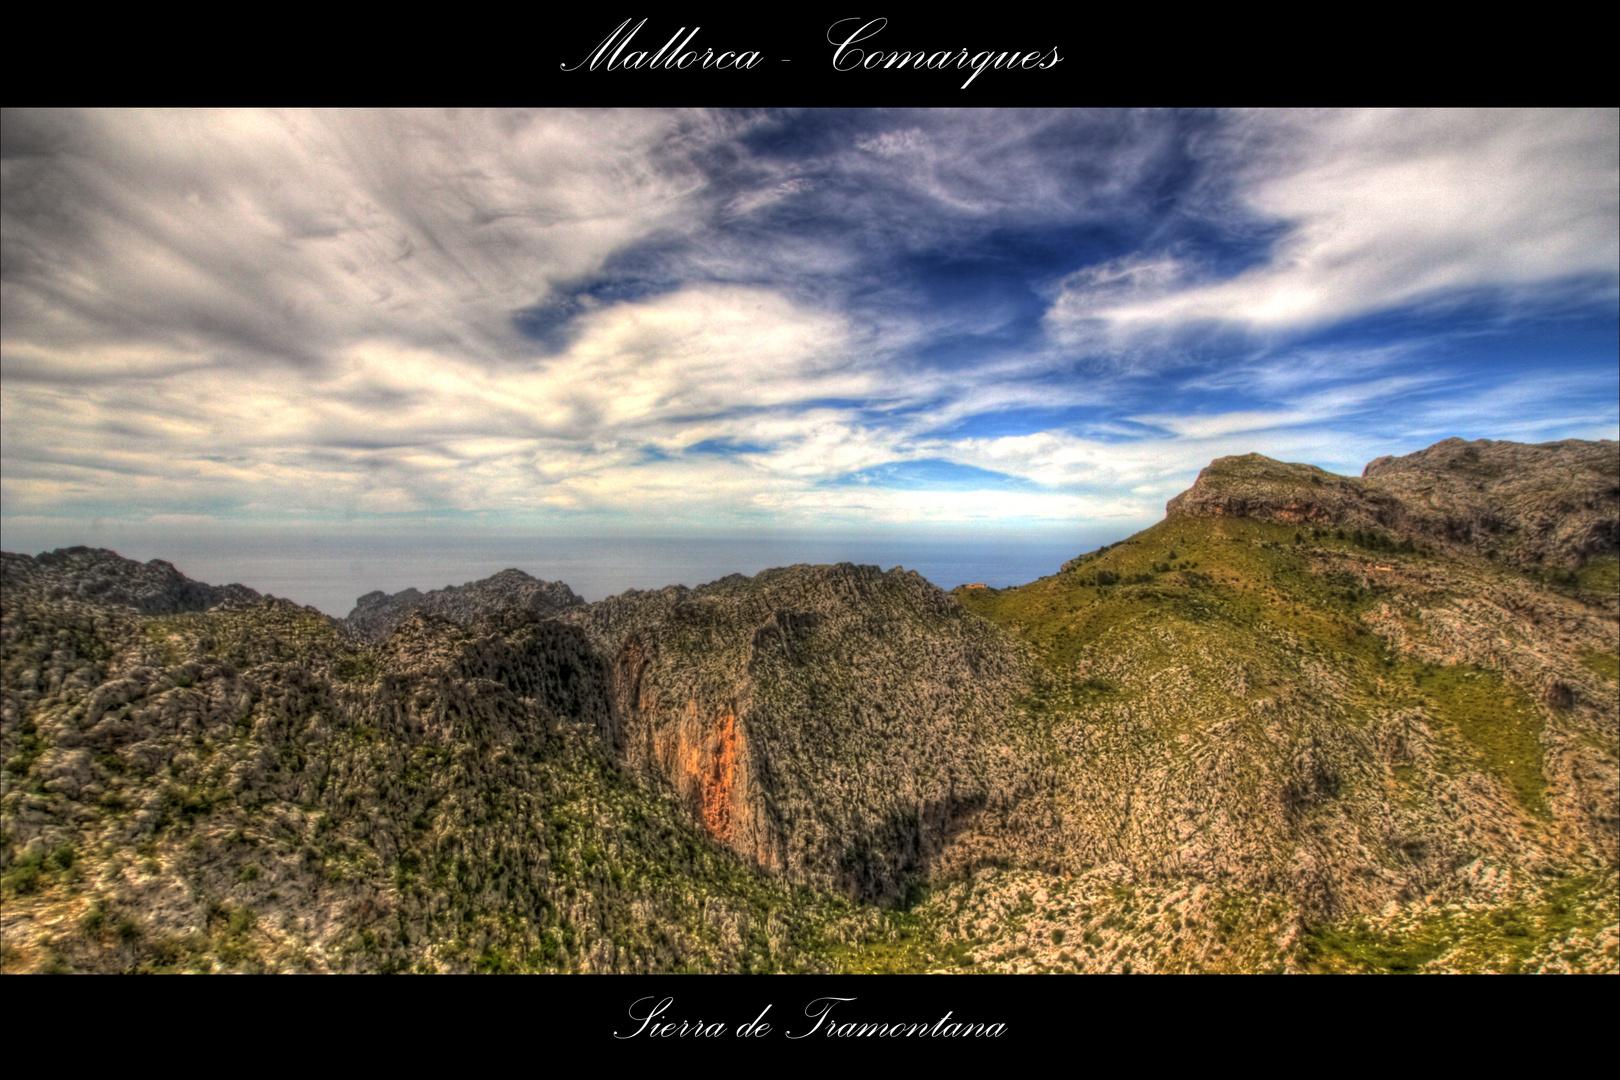 Mallorca - Sierra de Tramontana